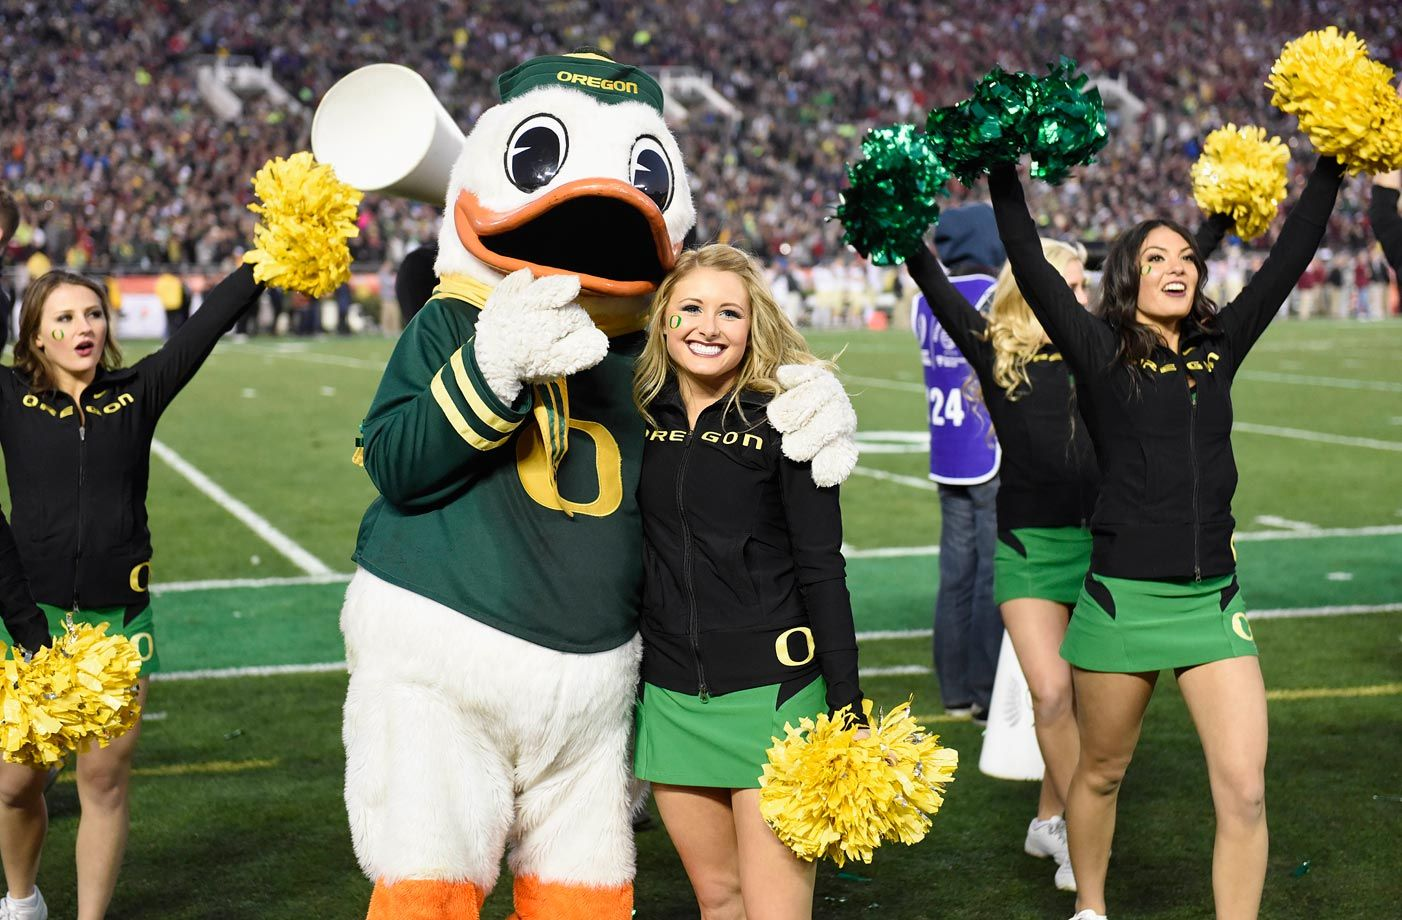 Pin by Kimberly Paulsonn on Oregon Ducks Cheerleaders